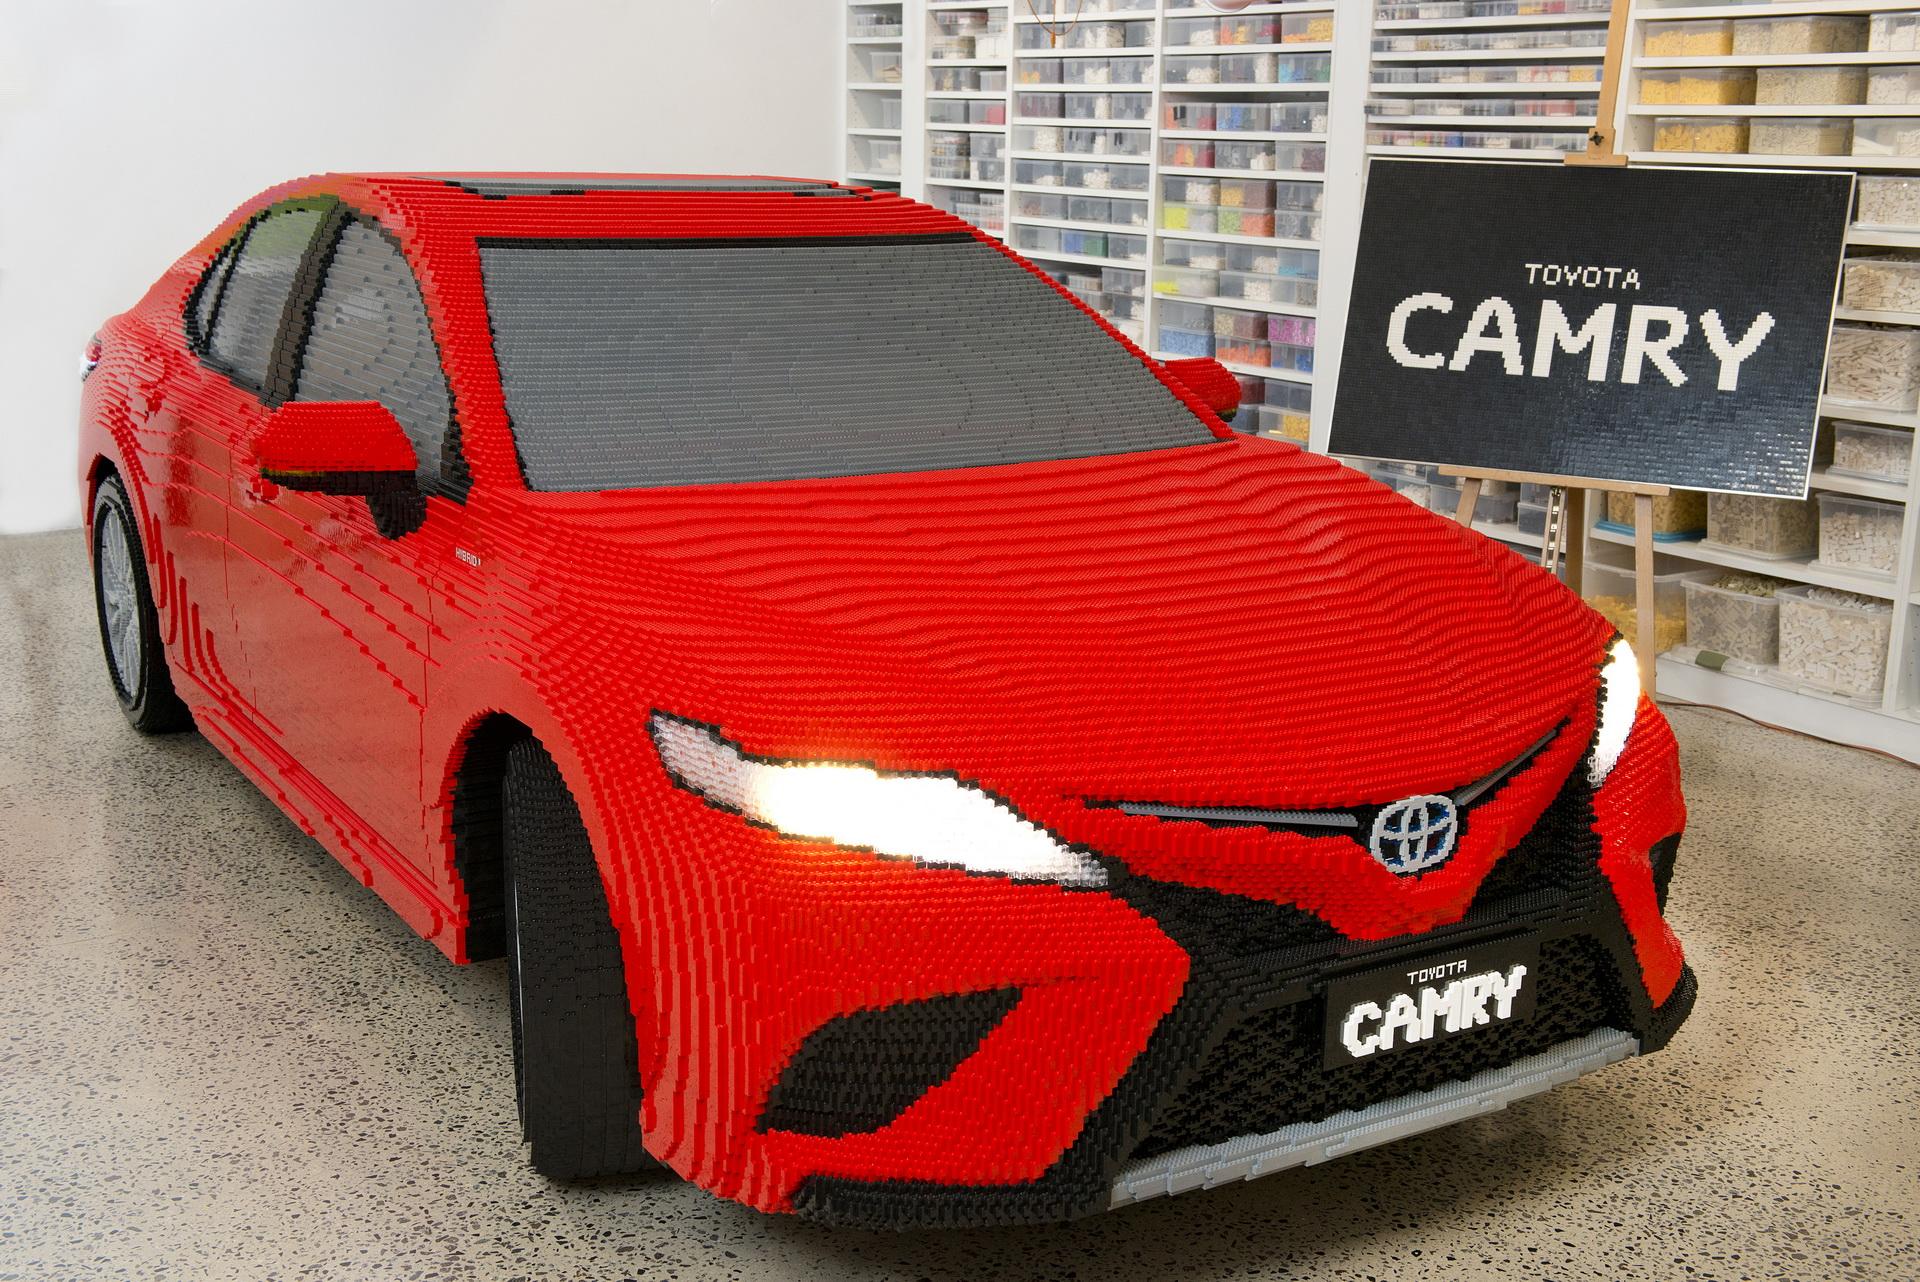 Lego Toyota Camry (1)